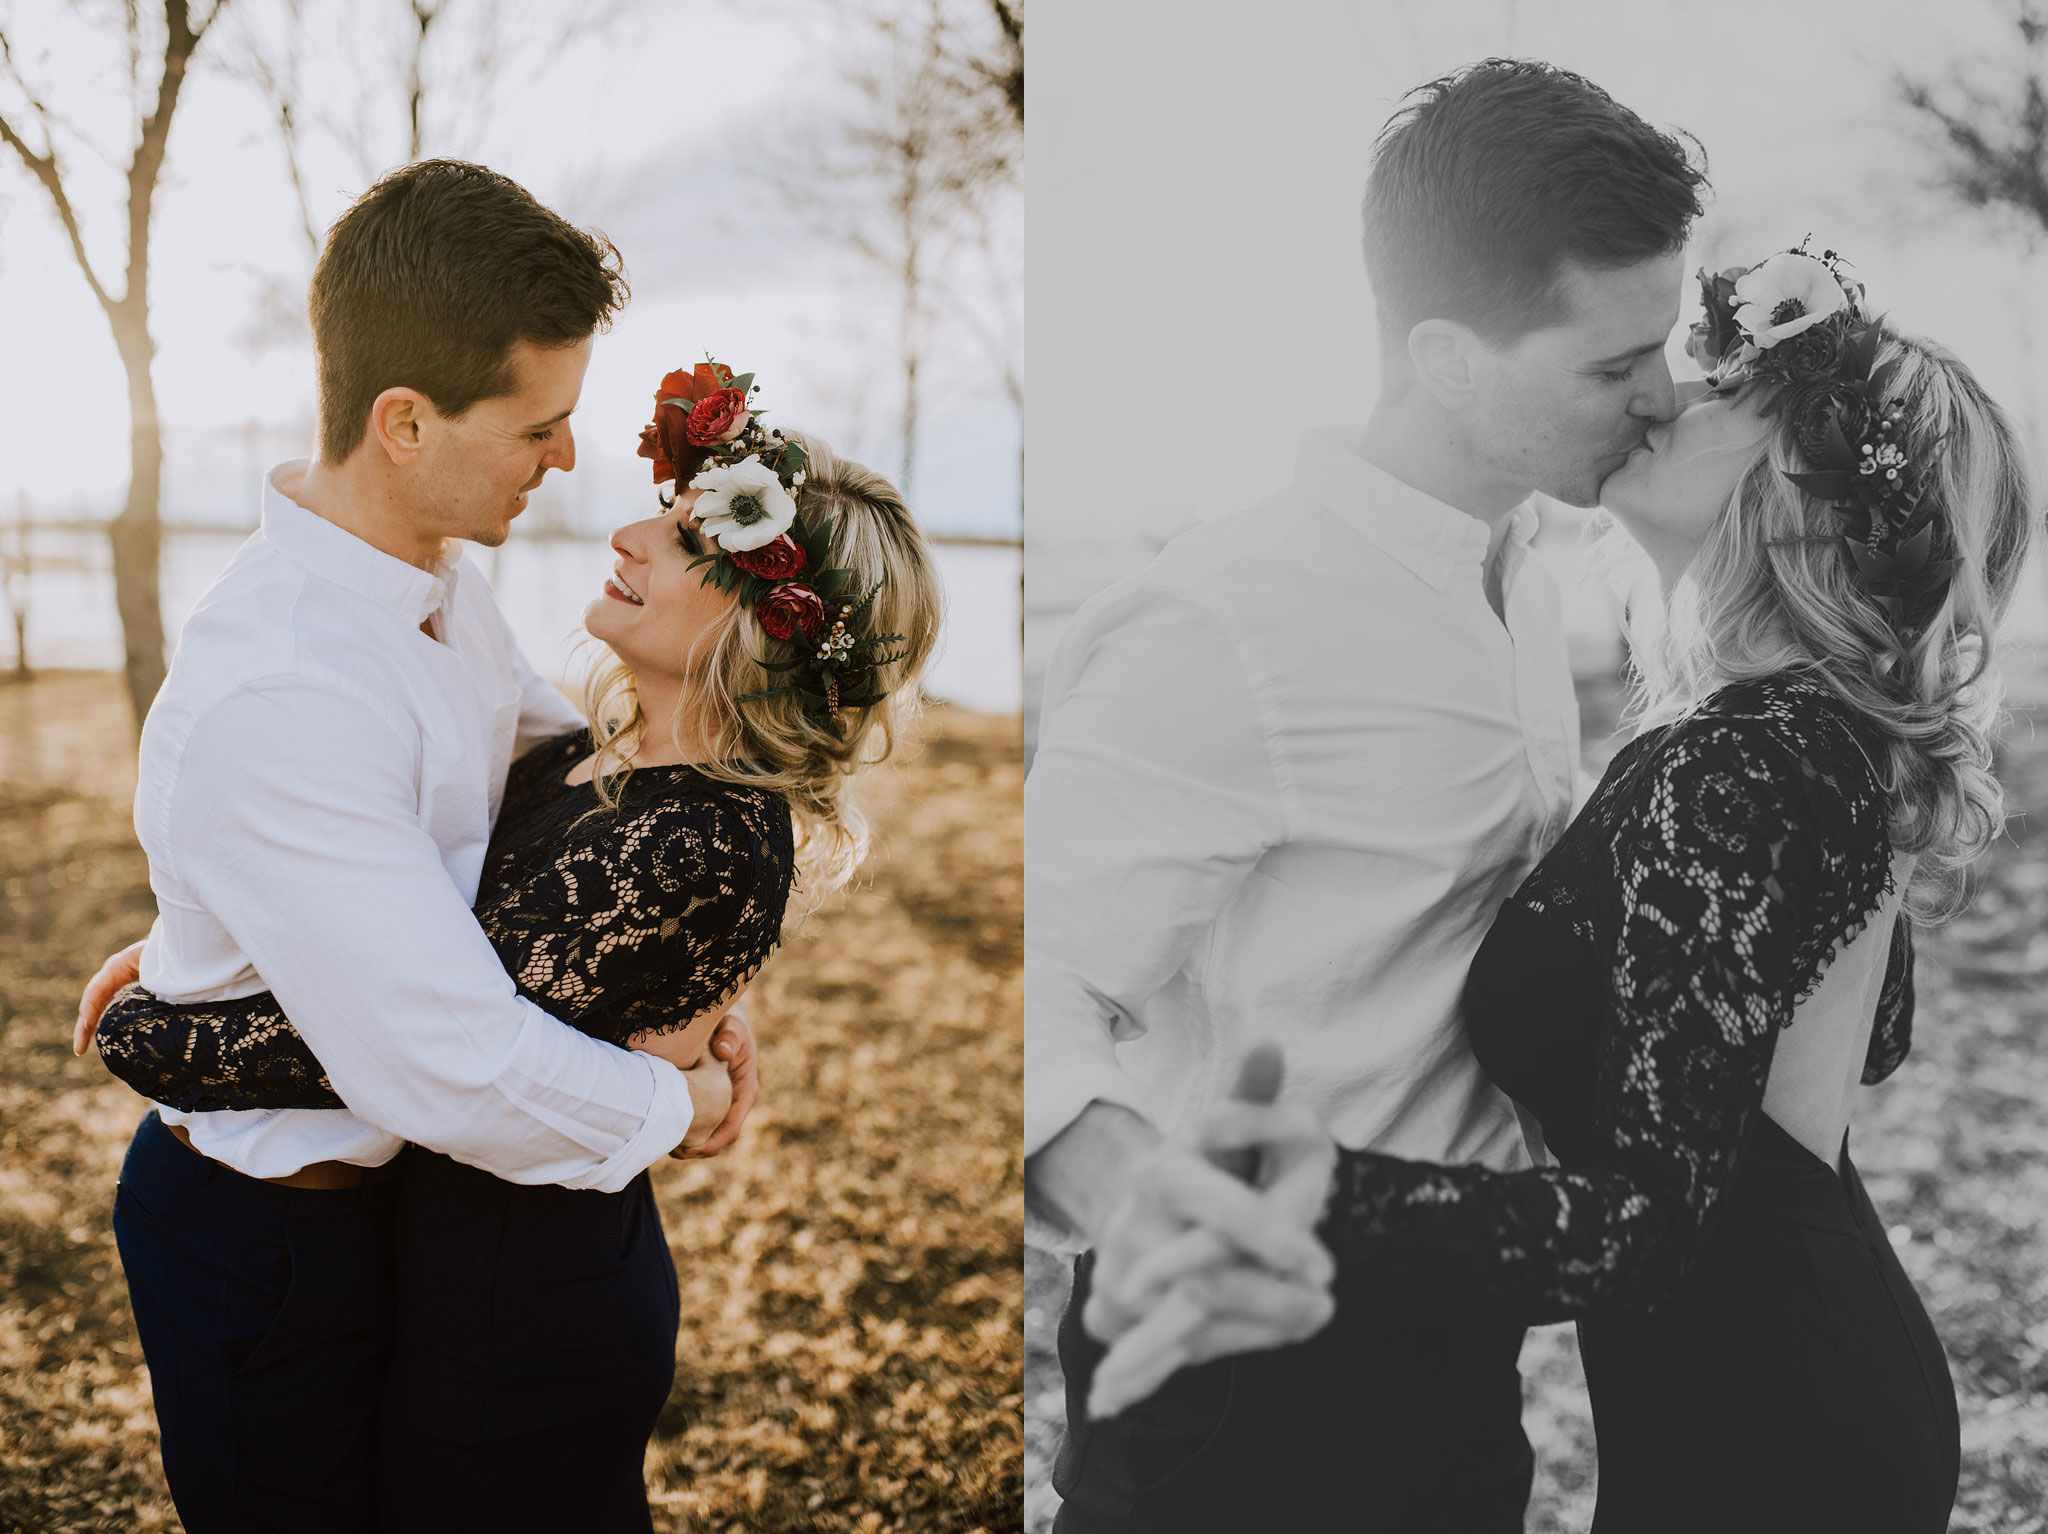 destination-winter-wedding-photographer-1.jpg